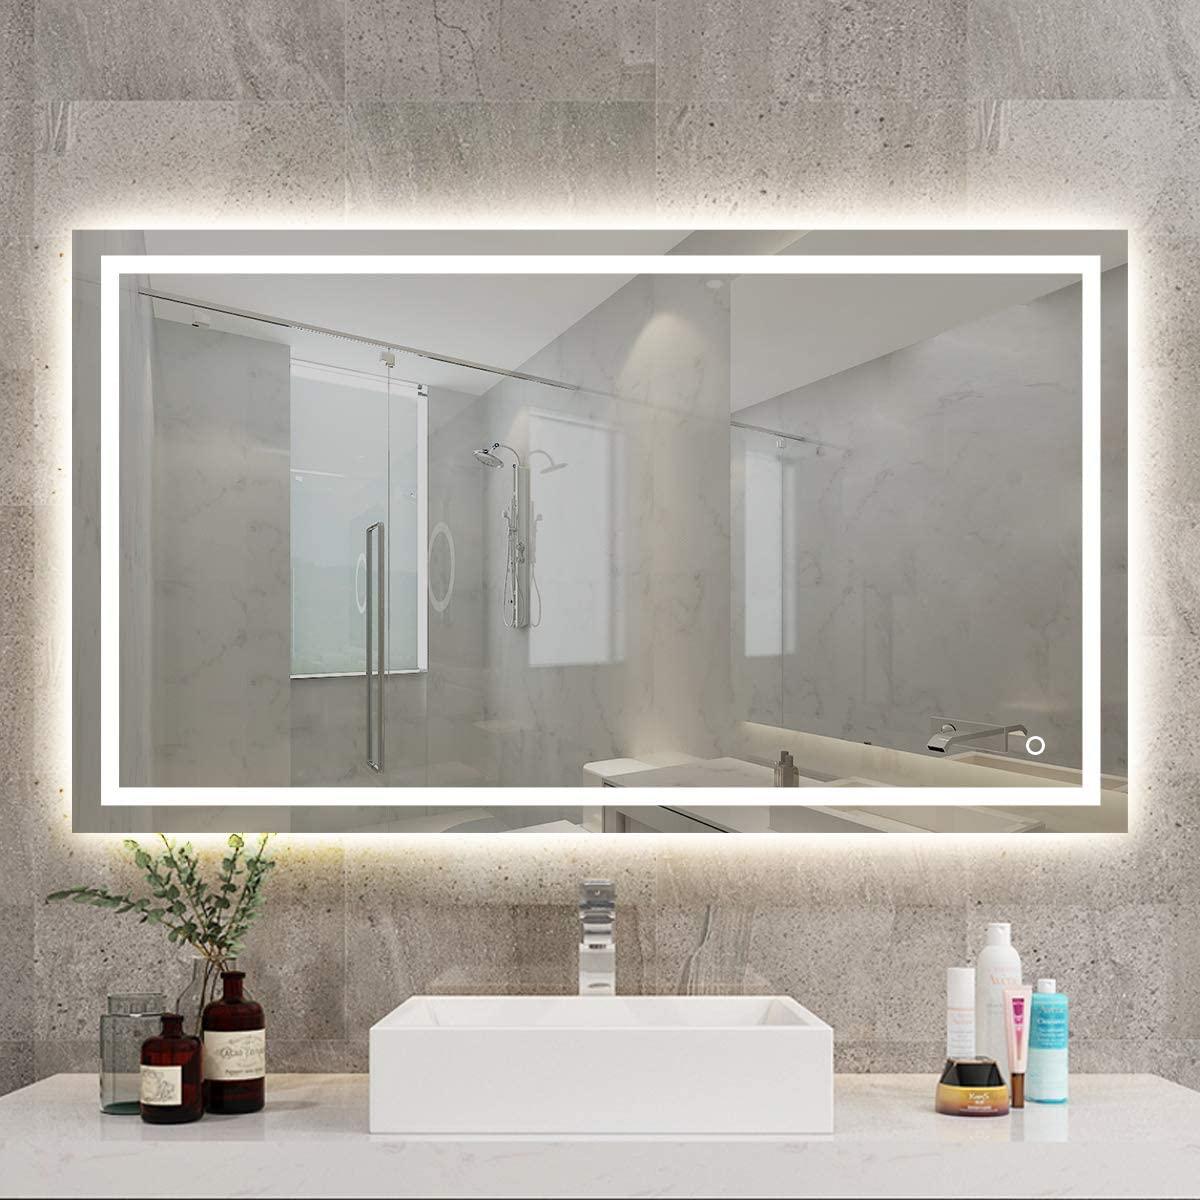 10-idee-per-arredare-un-bagno-cieco-16